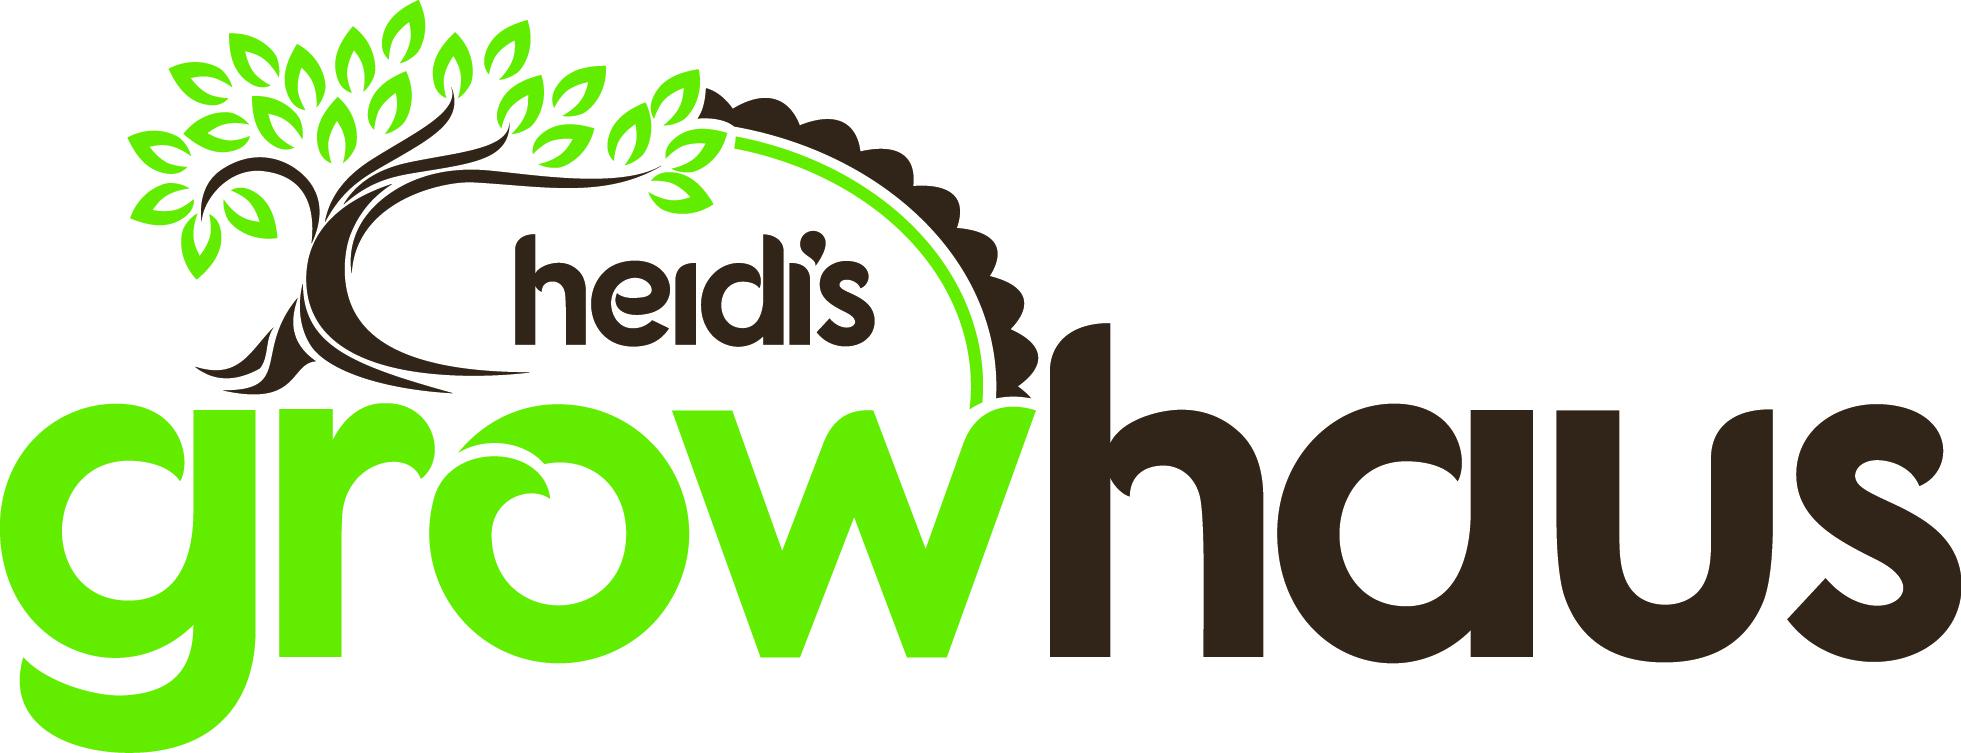 heidis growhaus_scallop(hi-res).jpg